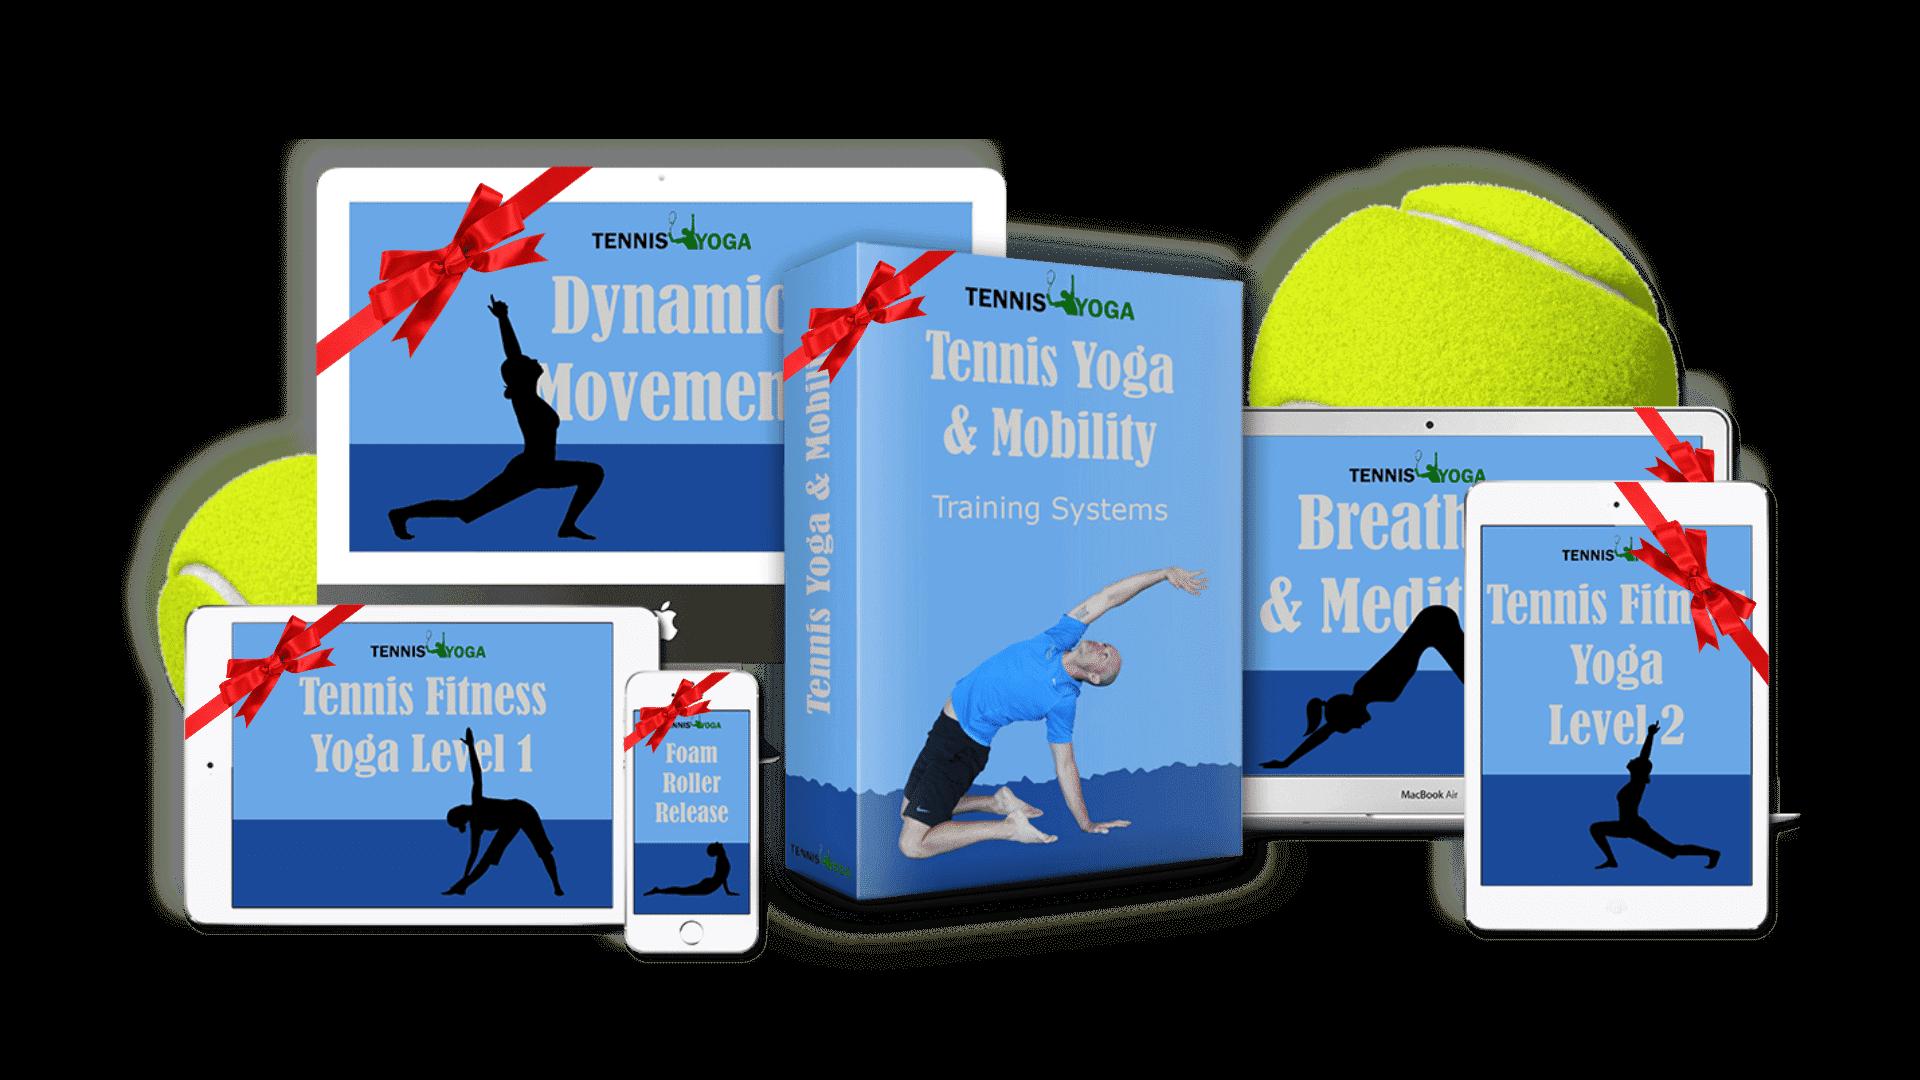 tennis-yoga,-mobility-injury-prevention-program